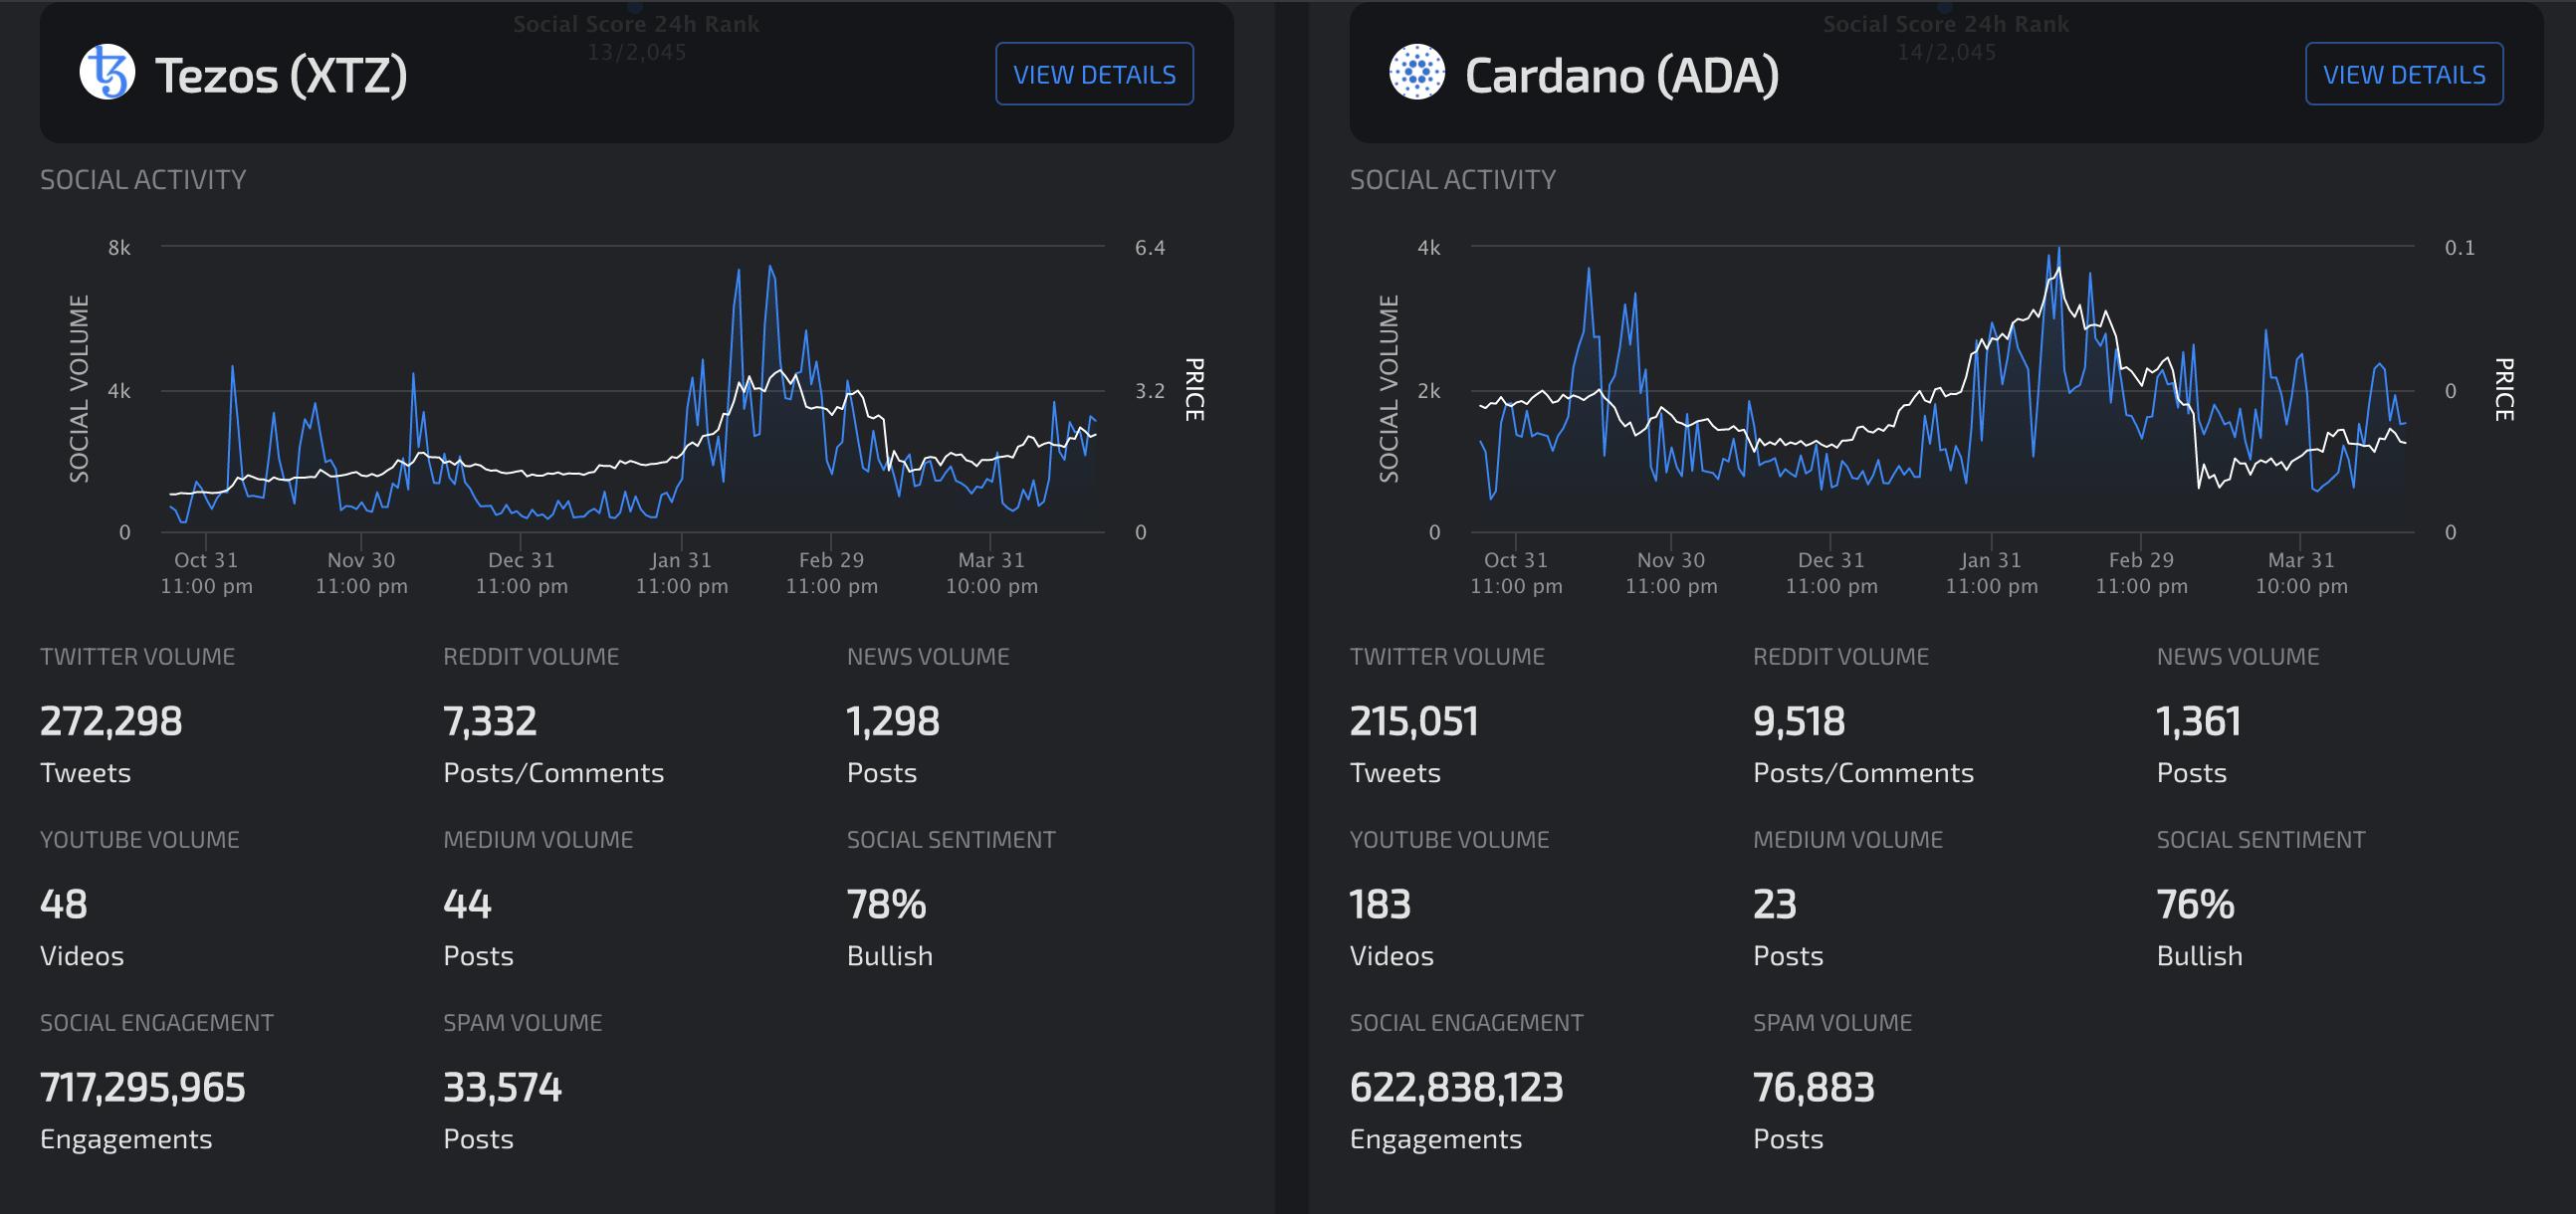 Tezos vs. Cardano Social Activity by LunarCRUSH